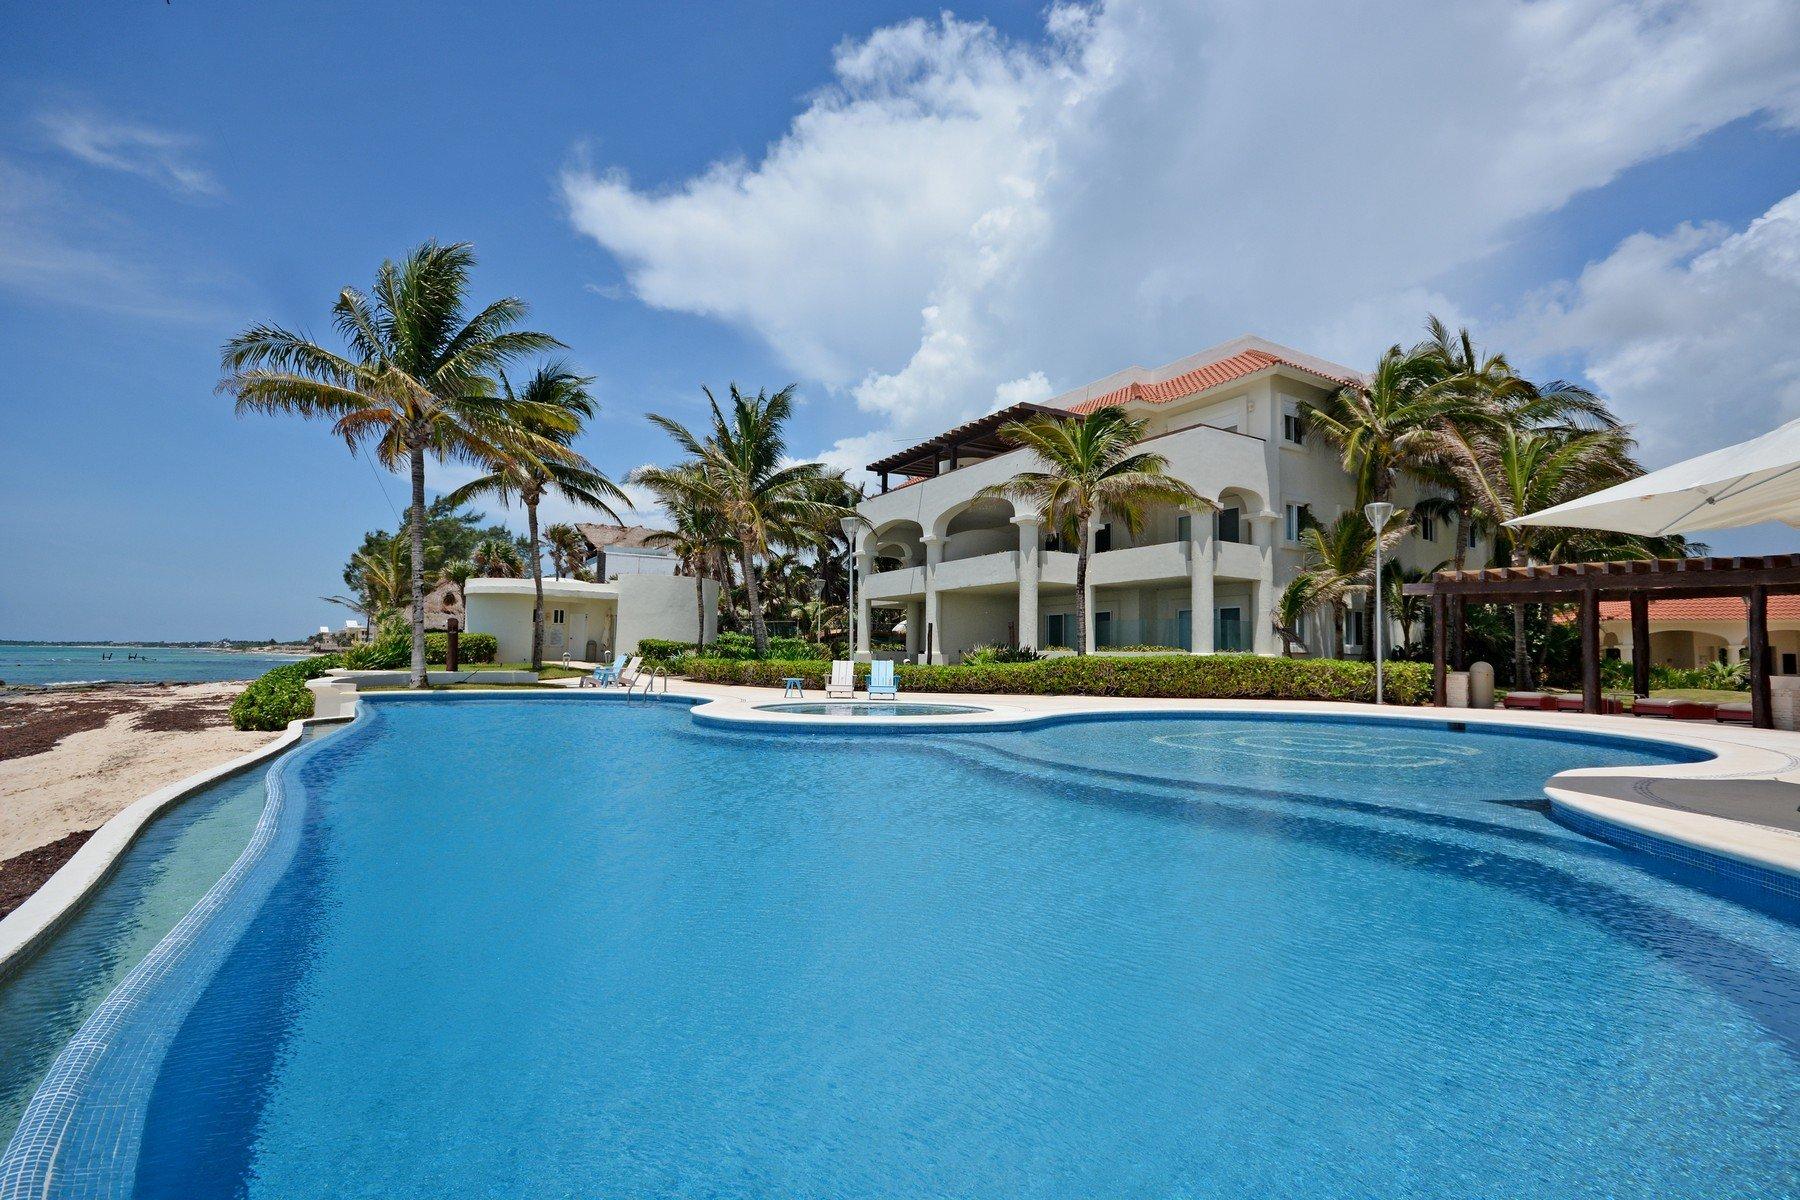 Apartment in Playa Paraiso, Quintana Roo, Mexico 1